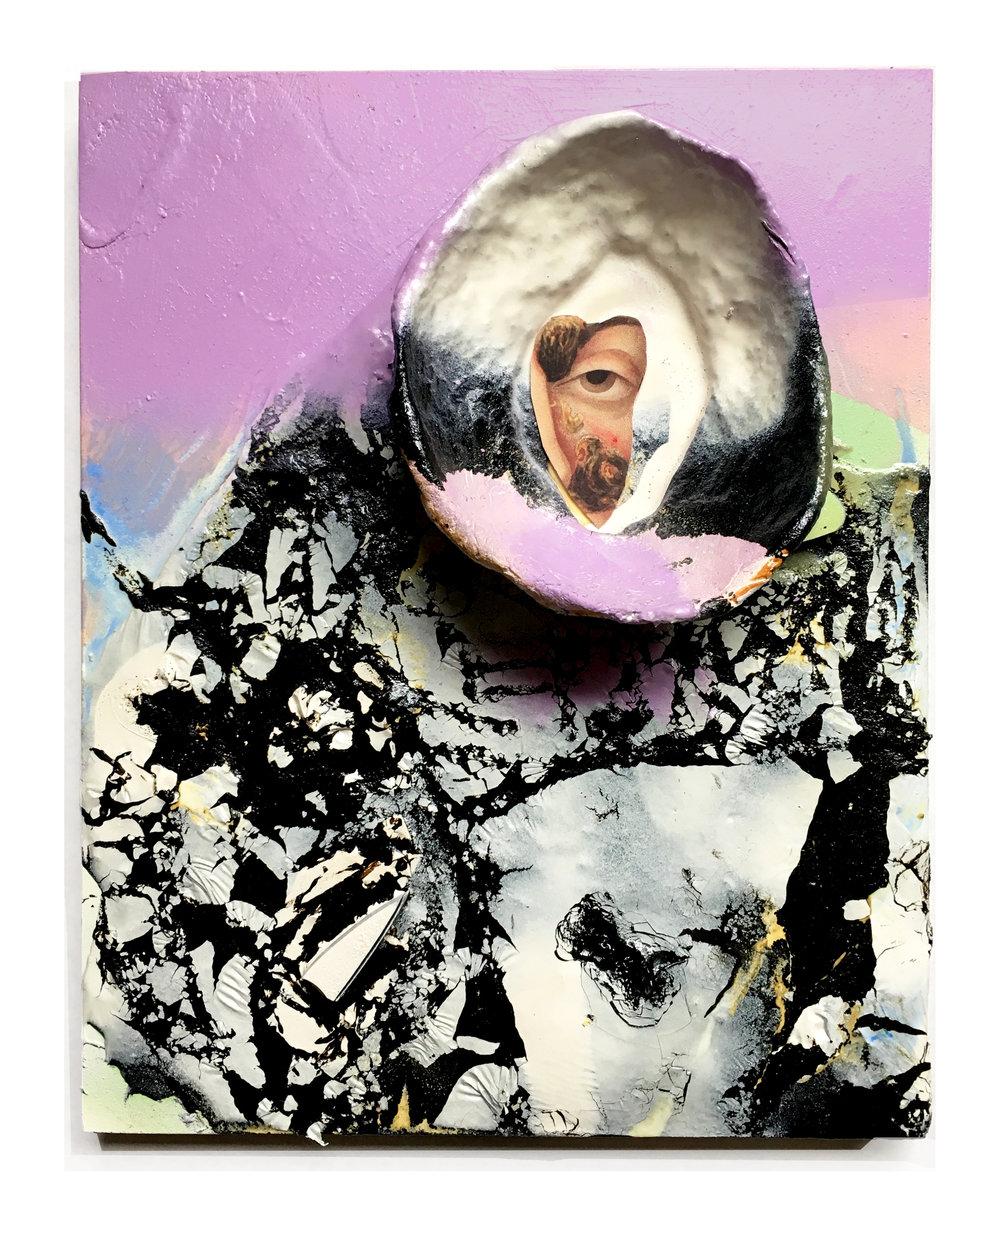 "Hole  8"" x 10""   Clay, tar, cut paper, spray paint, mixed media on panel 2018"